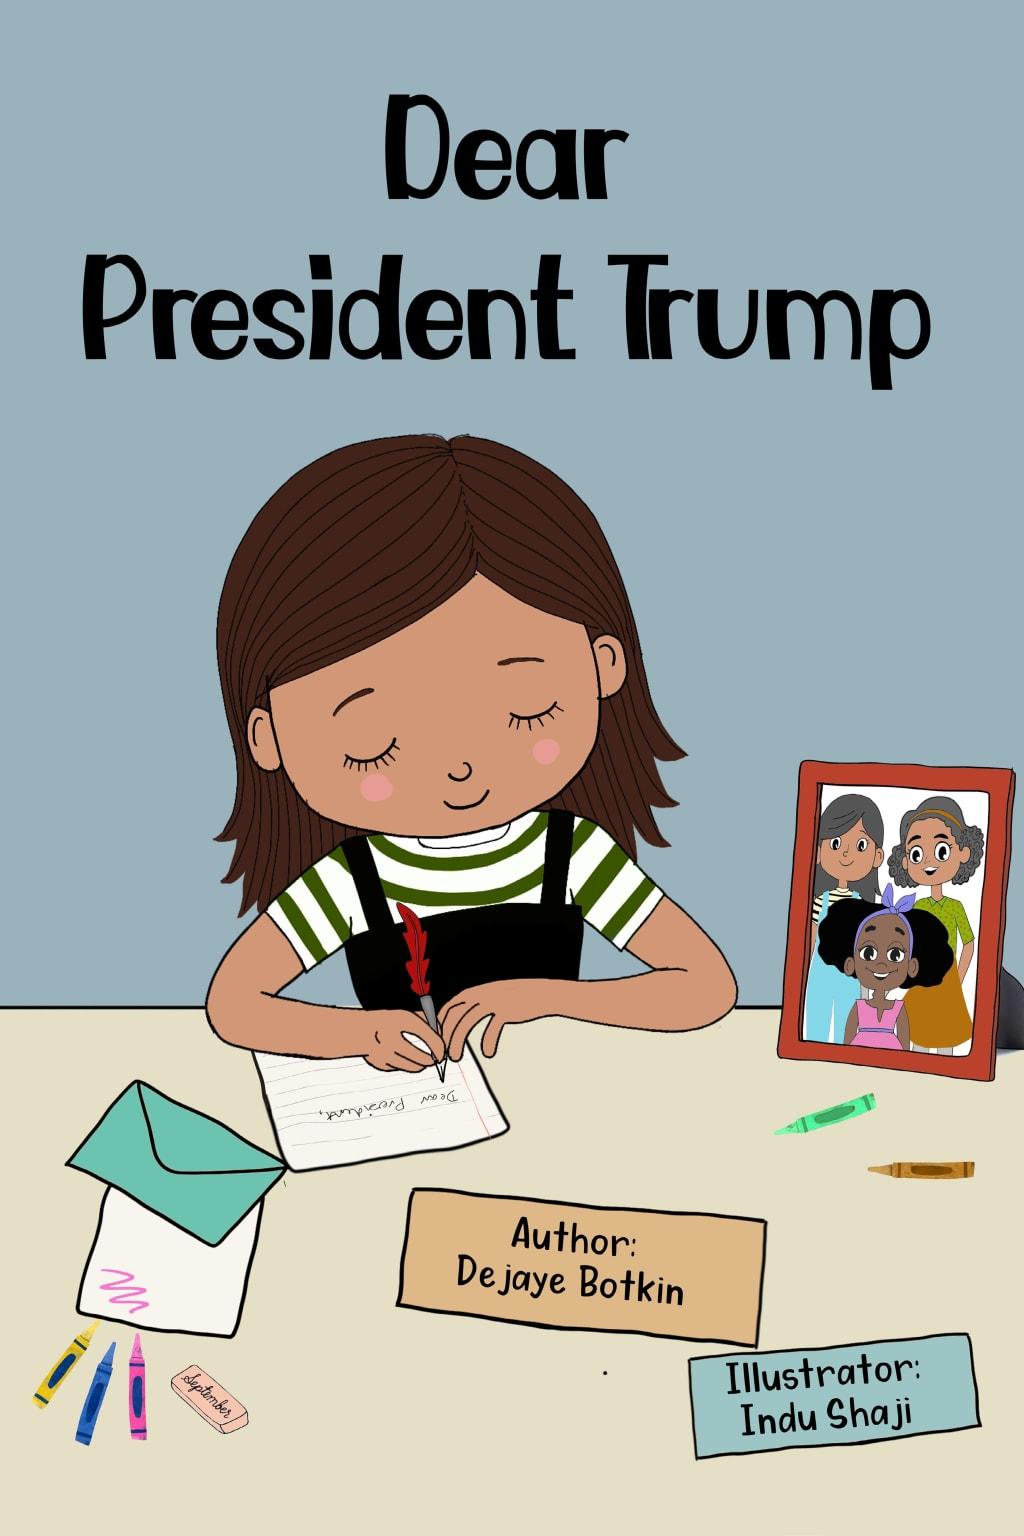 Dear President Trump